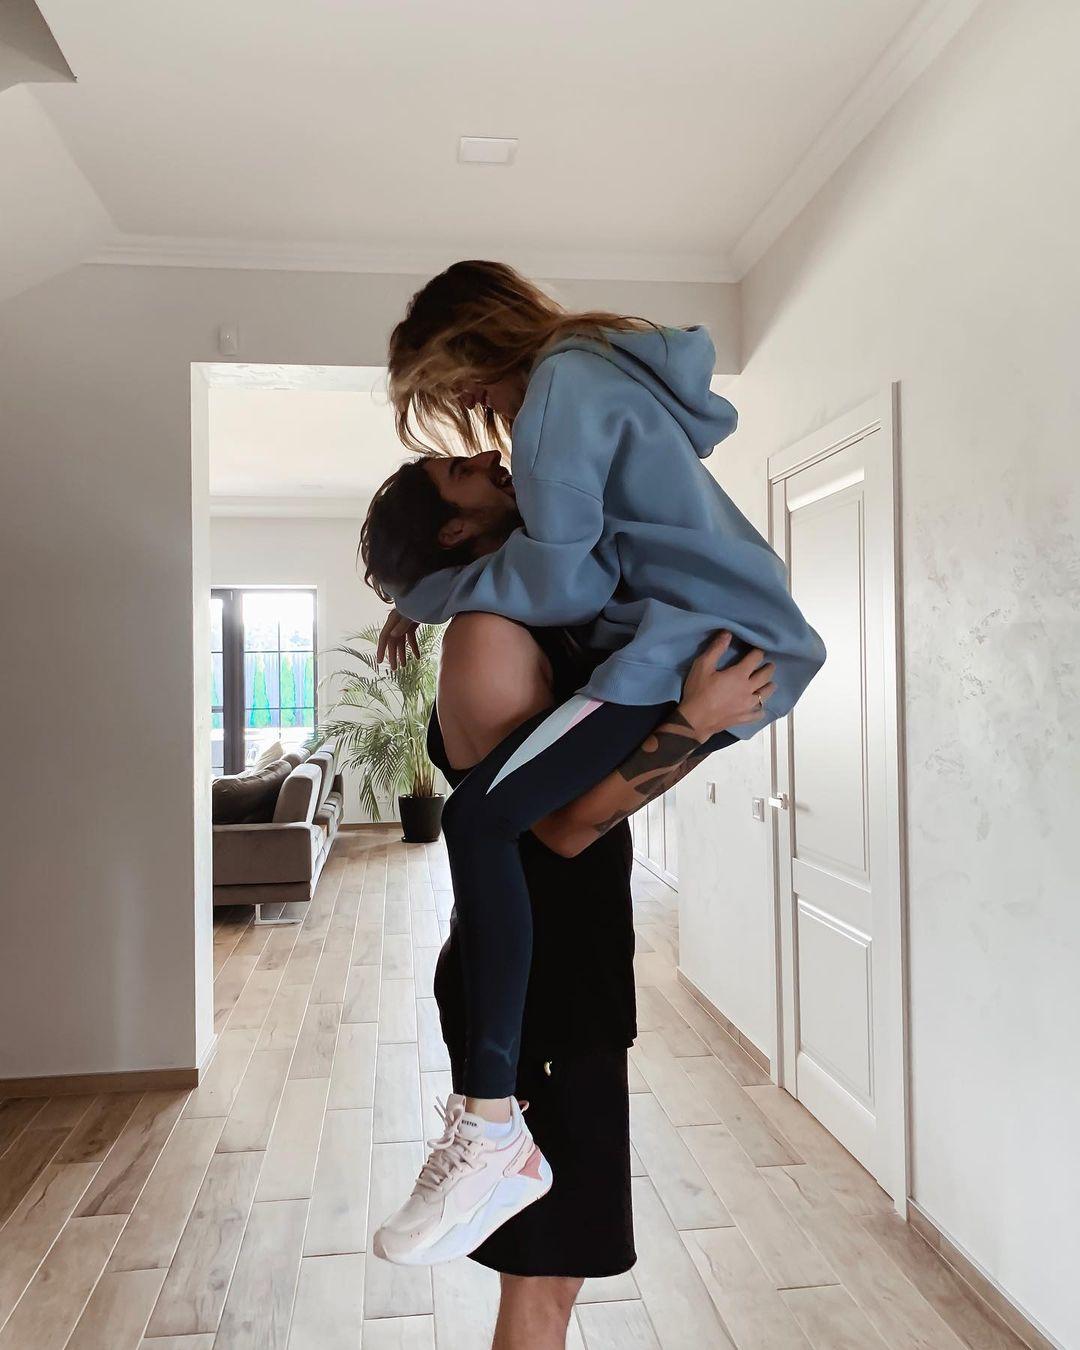 Love is: романтические снимки именинника Владимира Дантеса с Надей Дорофеевой